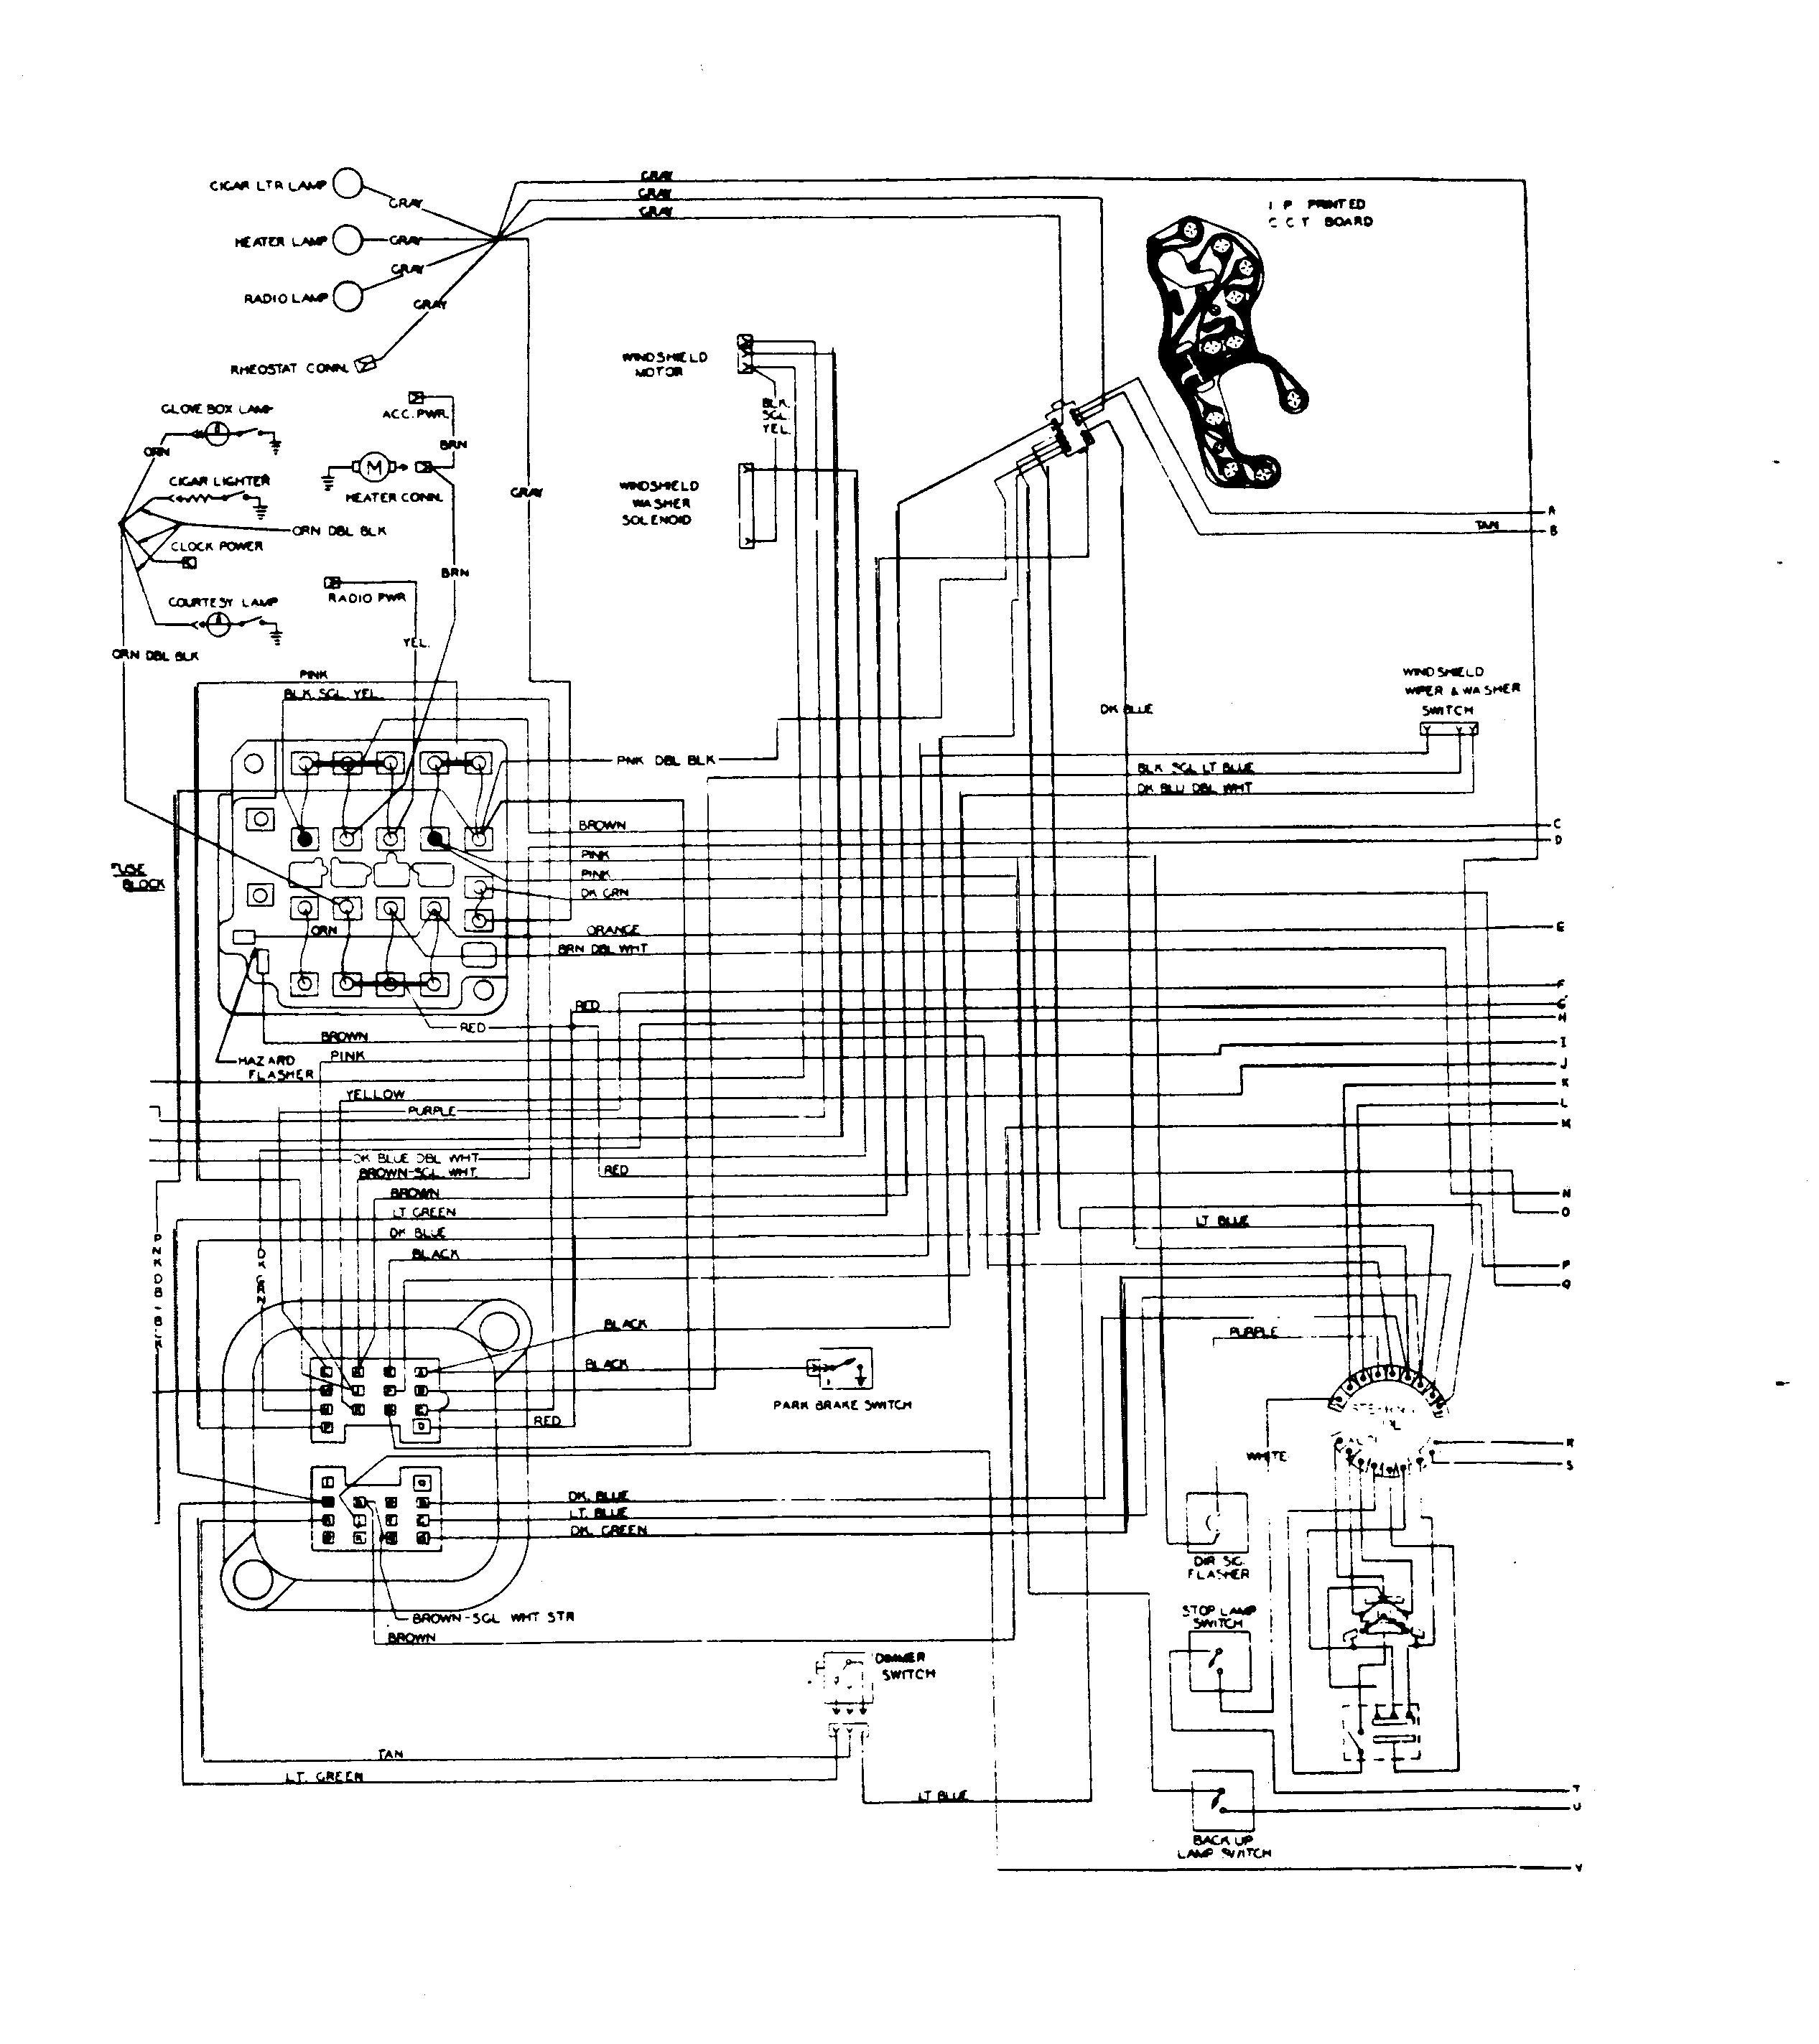 firebird headlight wiring diagram solidfonts 1980 firebird headlight switch wiring diagram automotive 1967 camaro